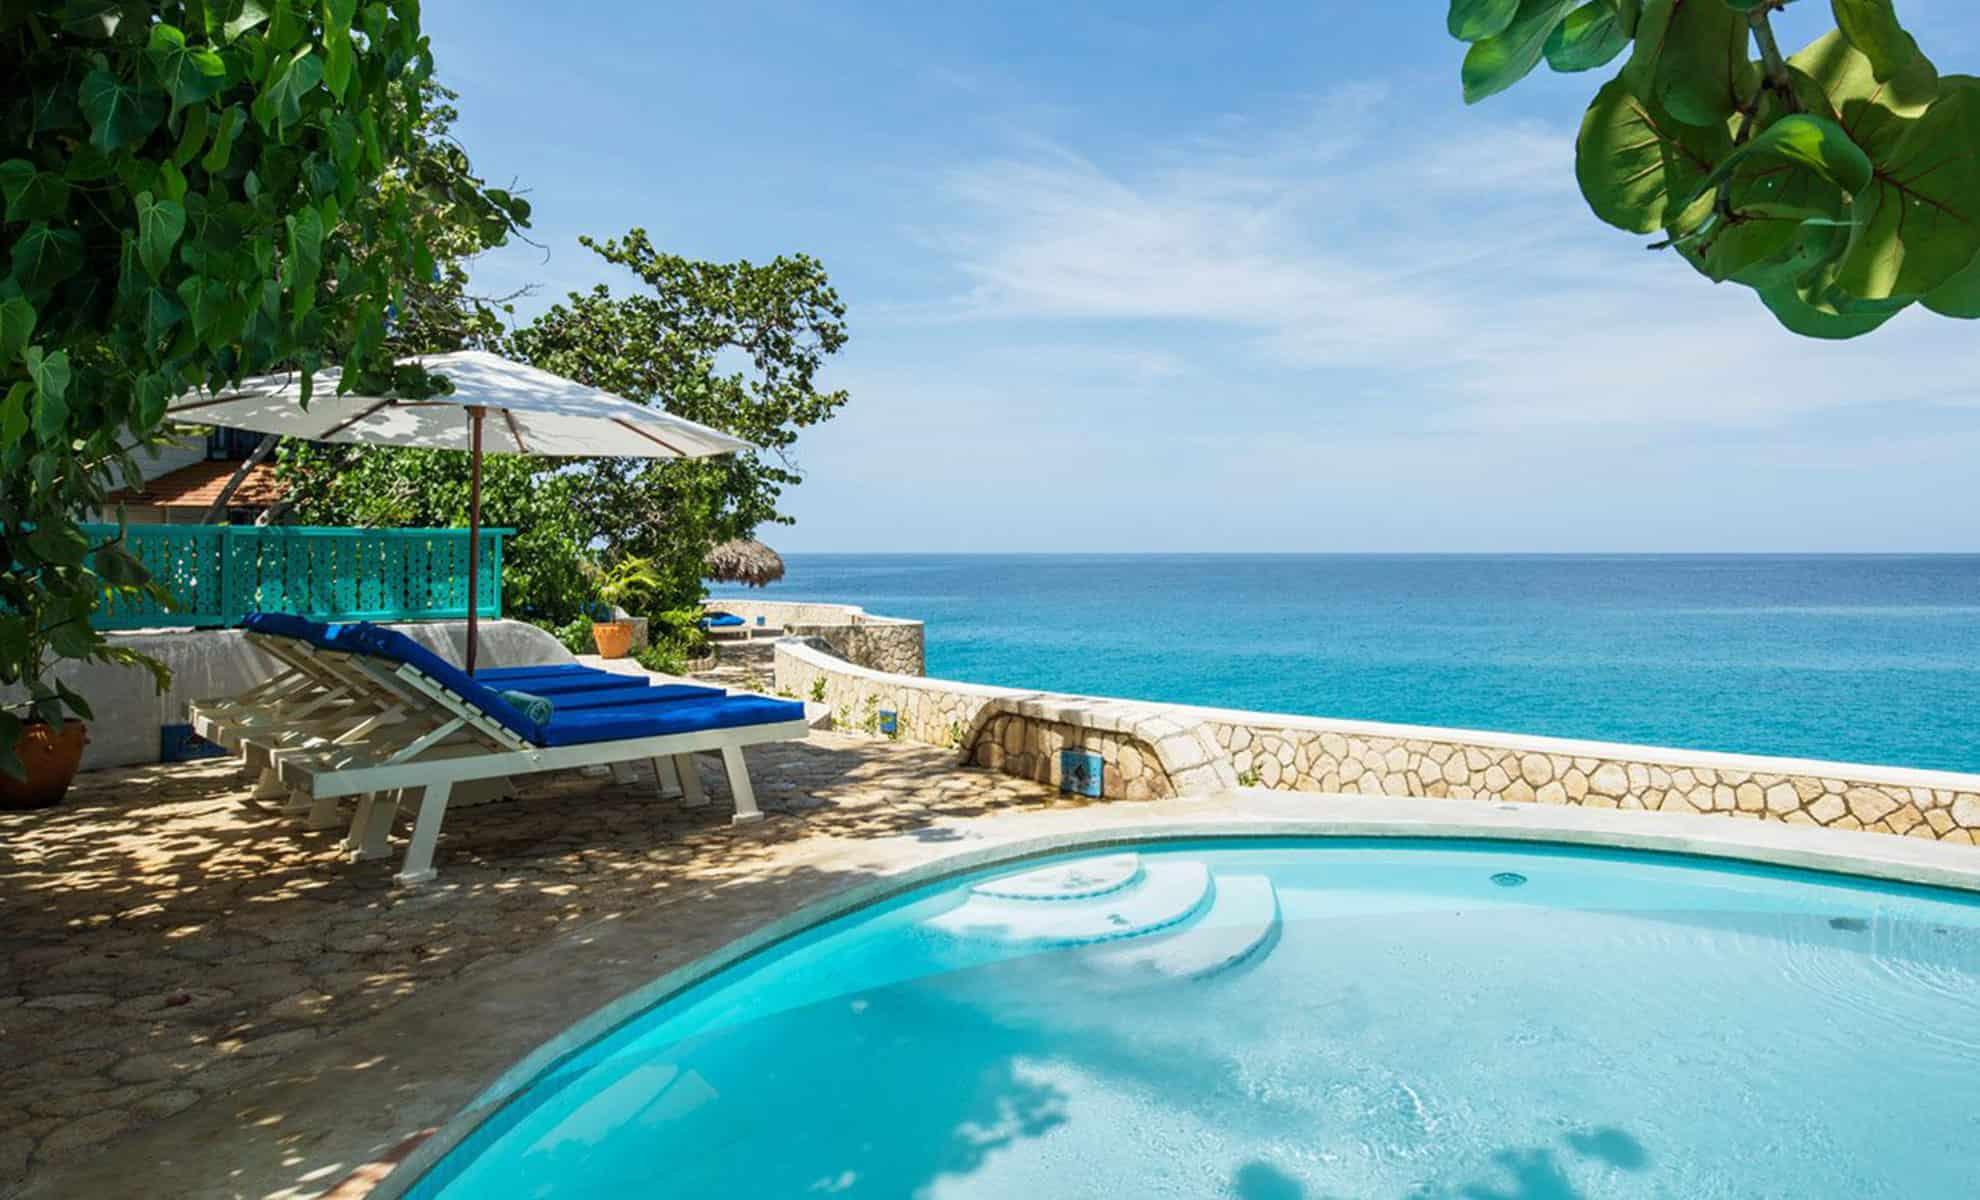 Couples Swept Away, Negril, Jamaica - Resort Review & Photos